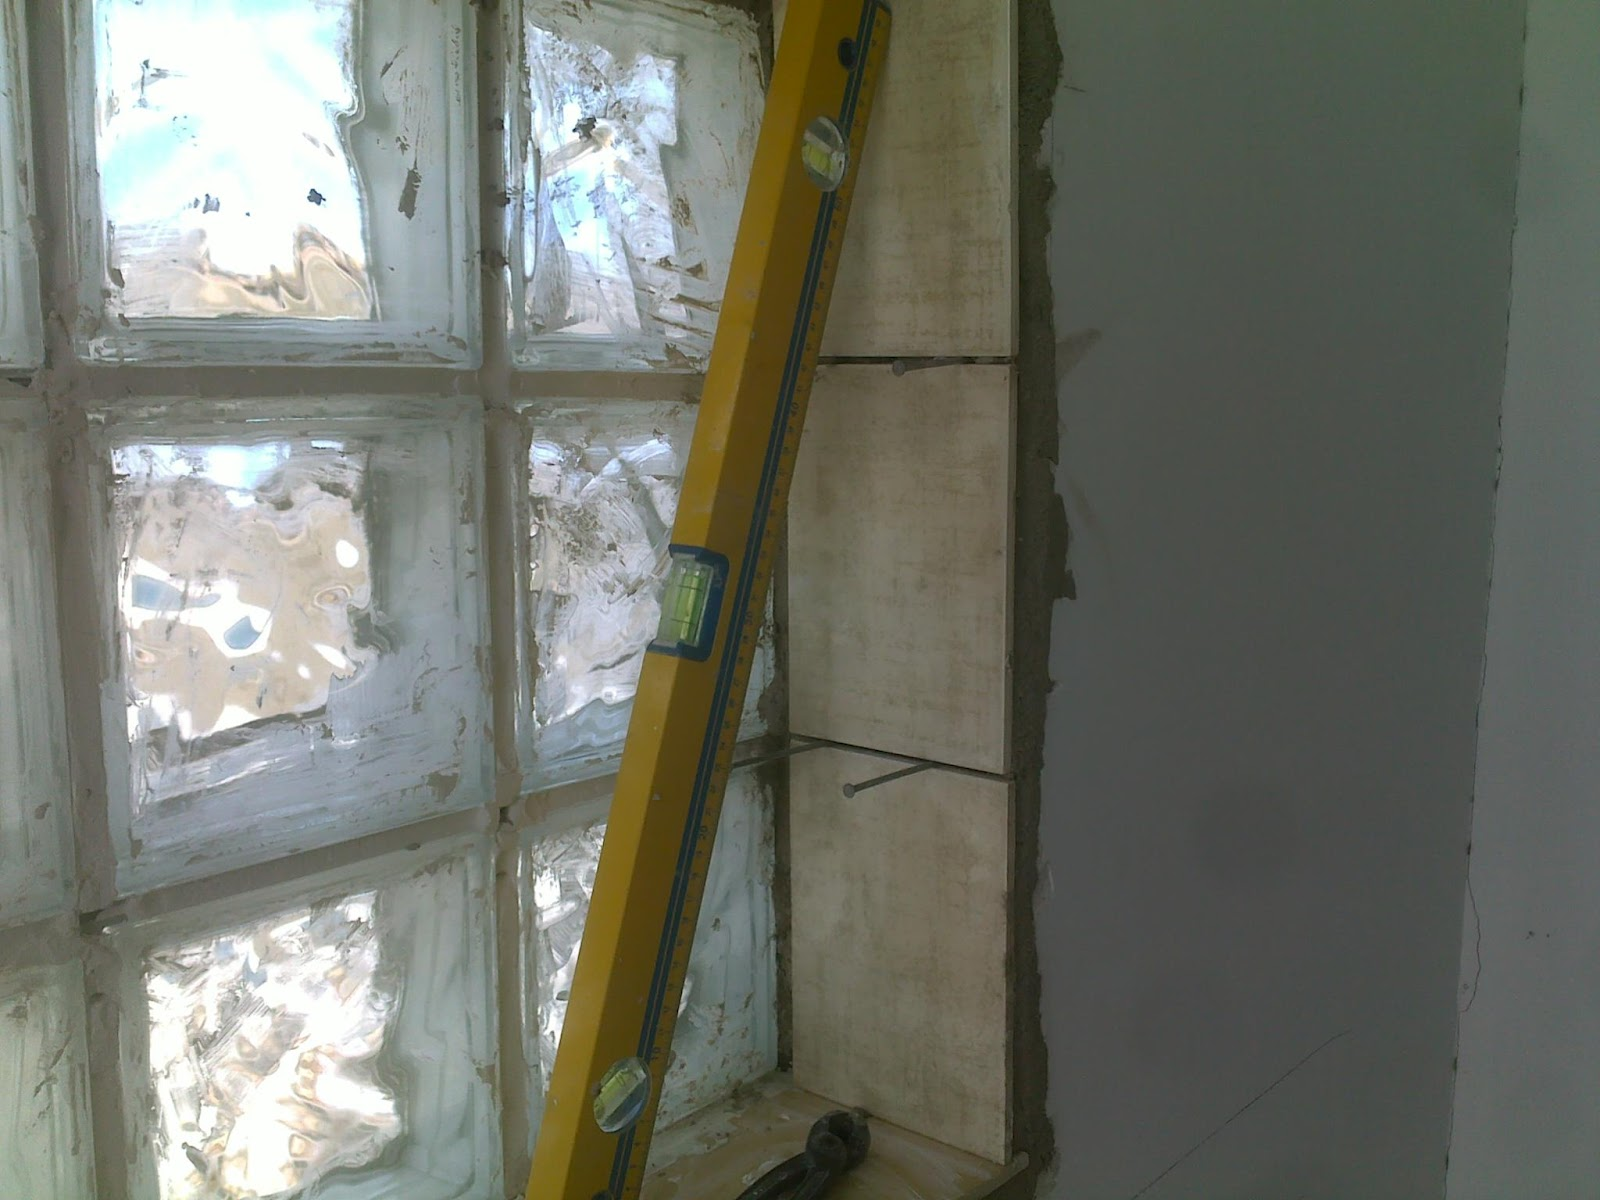 Sweet home work in progress finestra in vetrocemento - Piastrelle vetrocemento ...